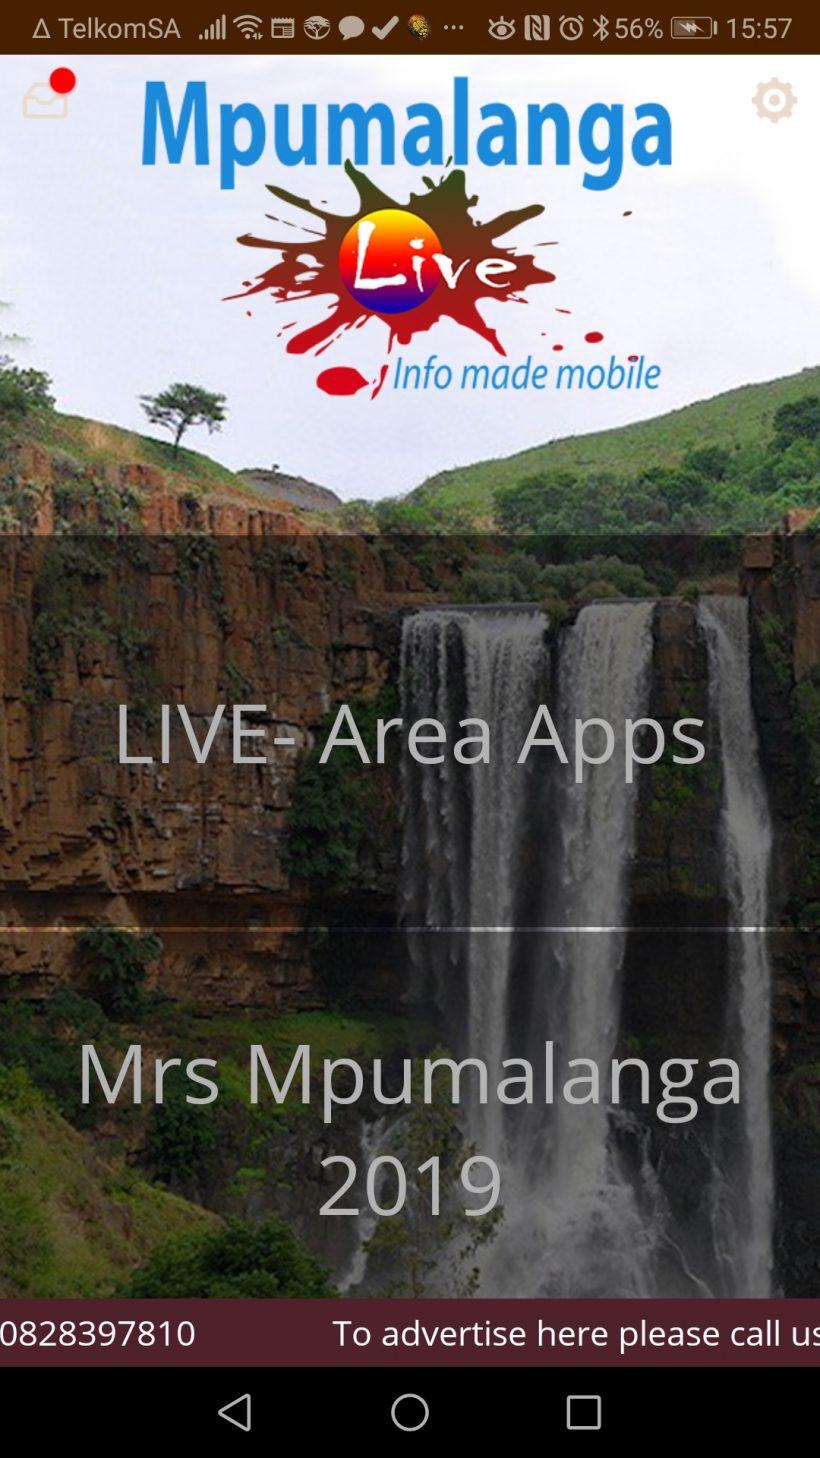 Screenshot_20191119_155713_com.app_afea0002.layout